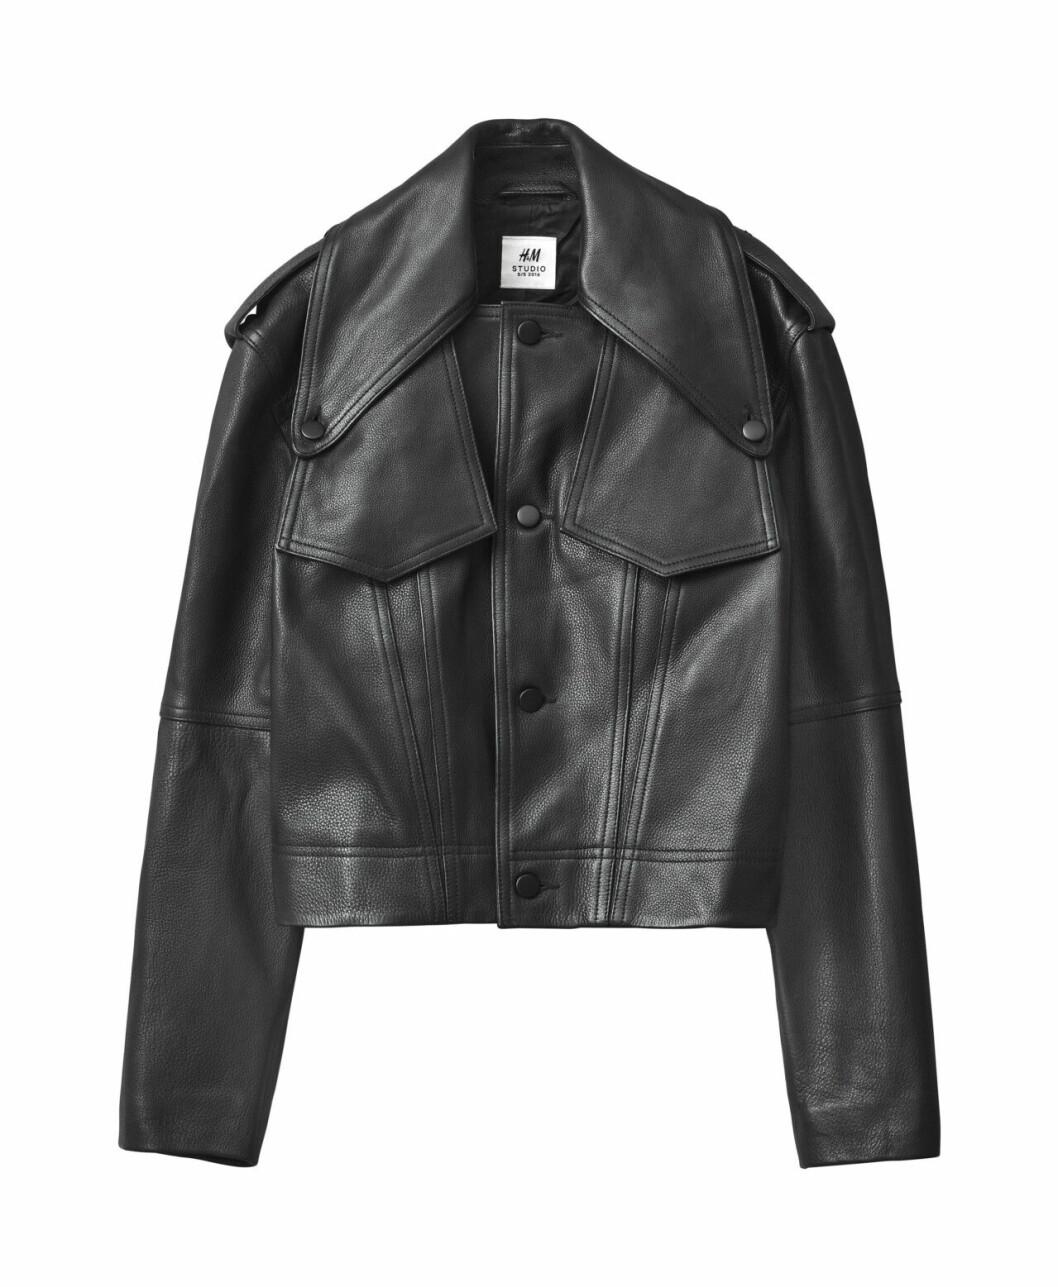 H&M Studio höstkollektion aw 2019 – svart skinnjacka